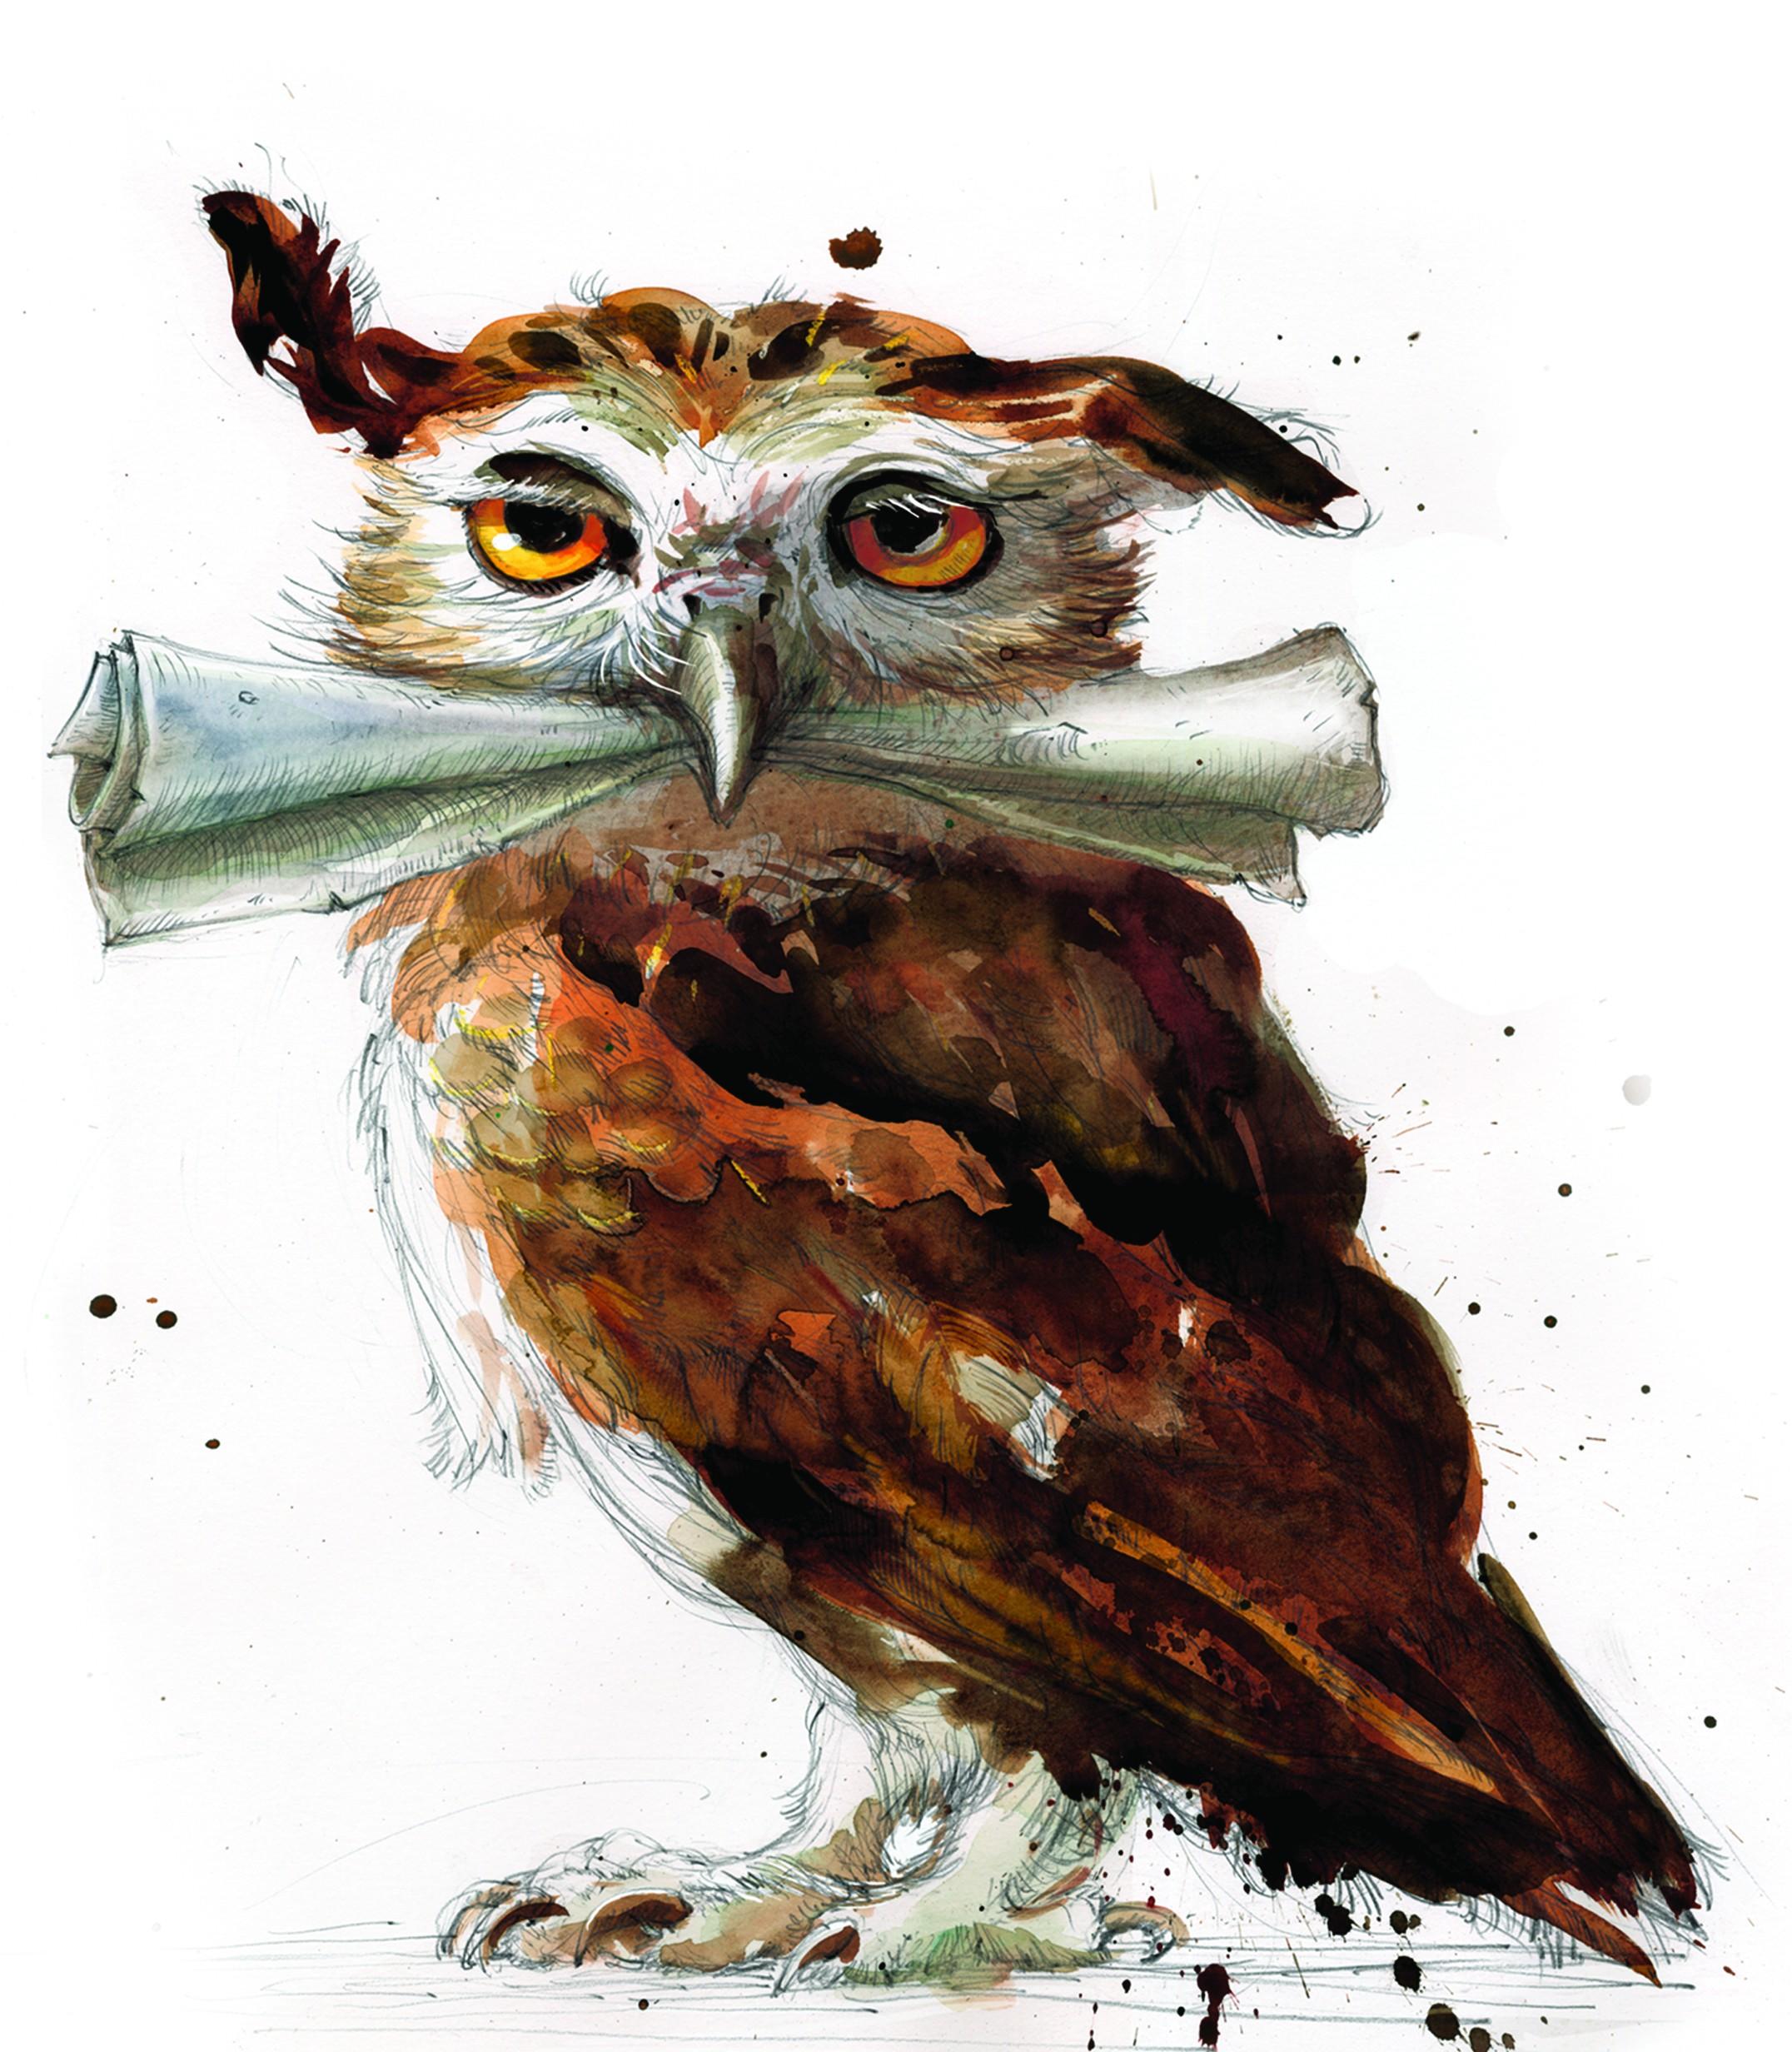 General 2152x2464 digital art fantasy art portrait display paper white background owl Harry Potter yellow eyes paint splatter painting